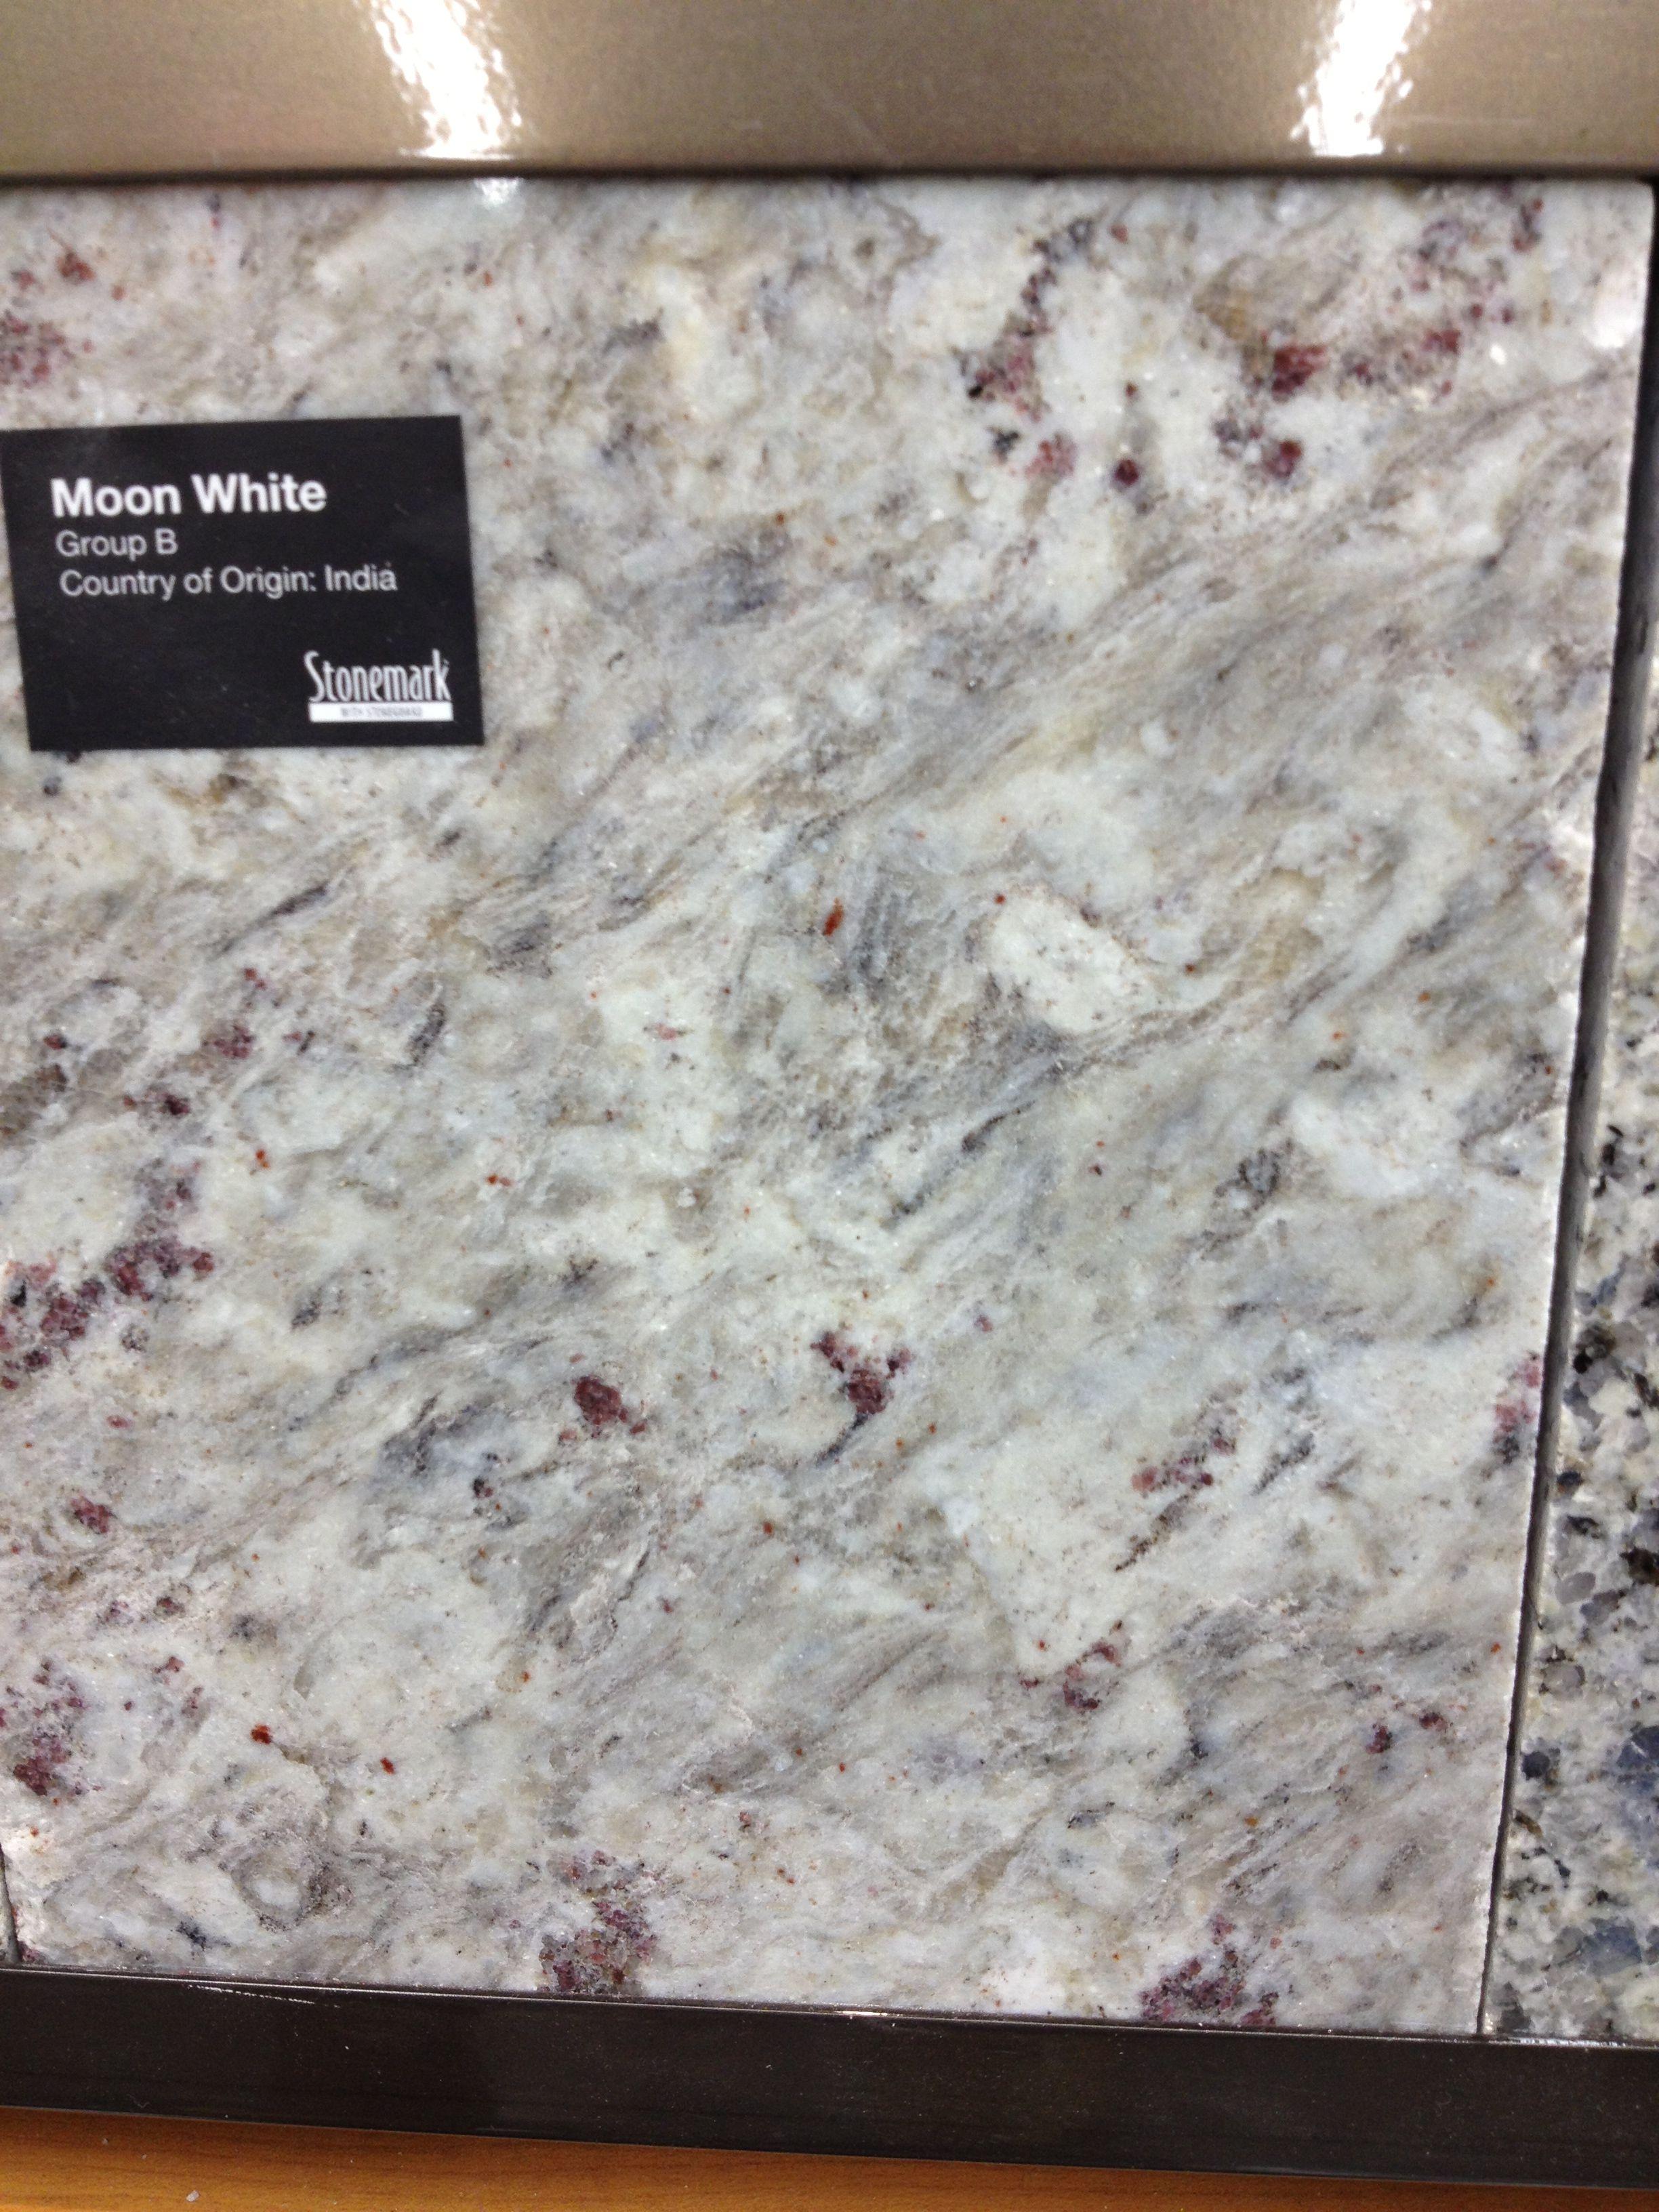 Moon White Granite Very Much Like Kashmir White But Less